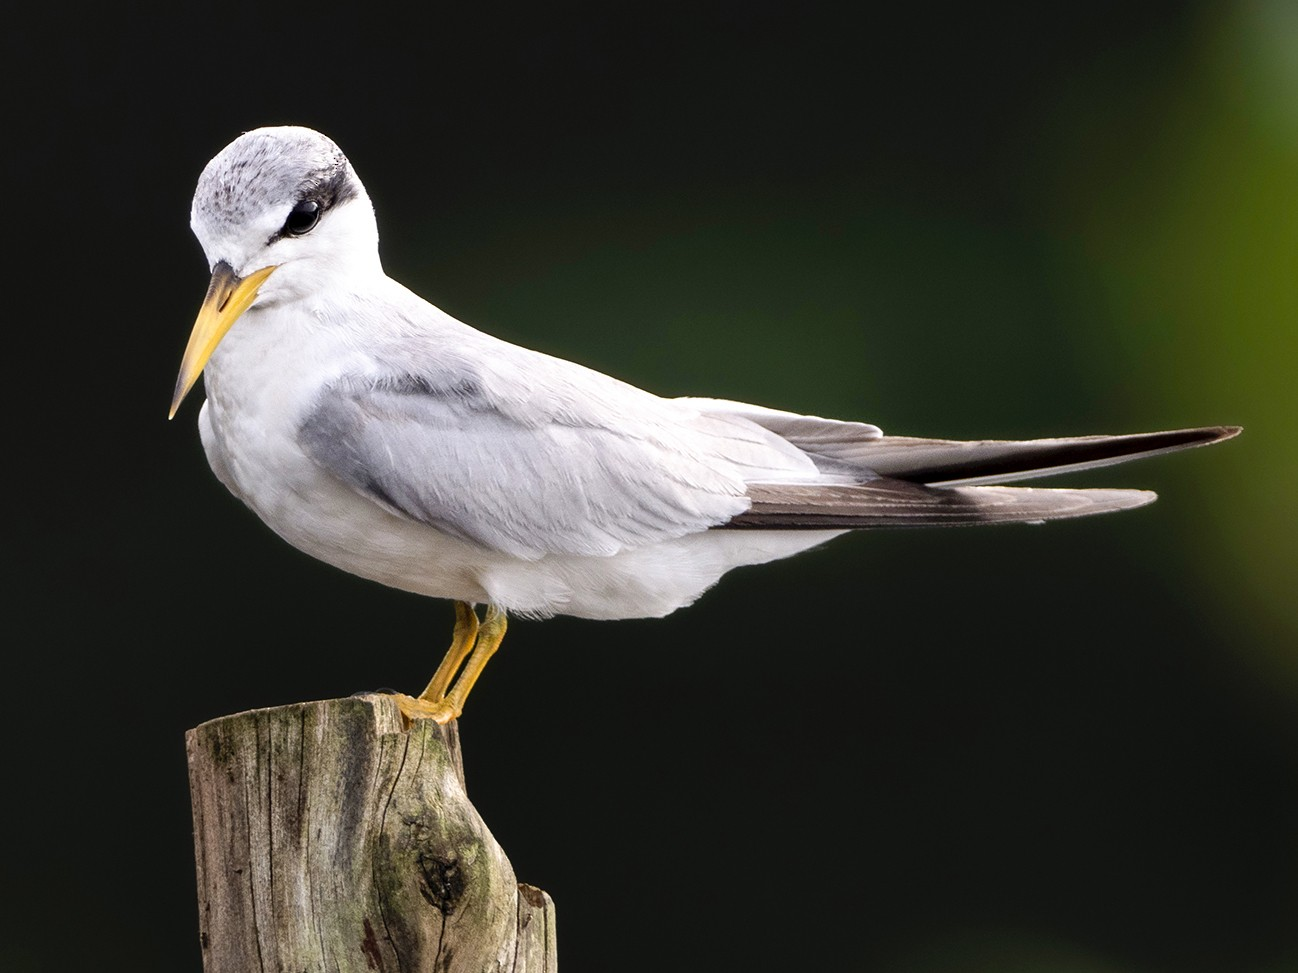 Yellow-billed Tern - Andres Vasquez Noboa - Tropical Birding Tours